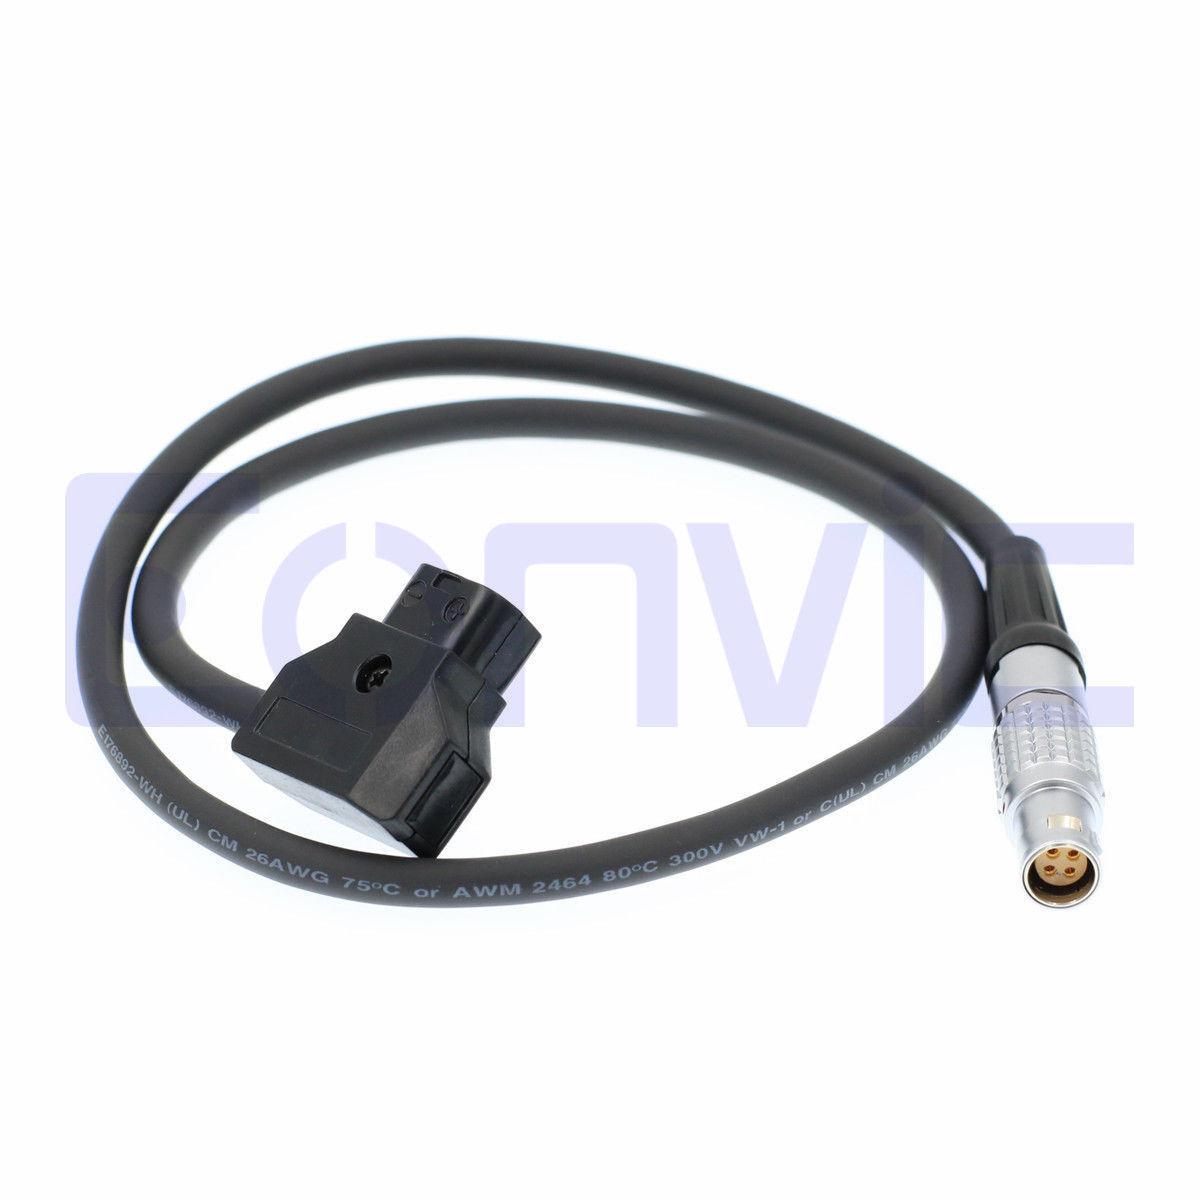 Canon C300 Mark II C100 C200 C500 Power Cable D-Tap to 4 Pin Female